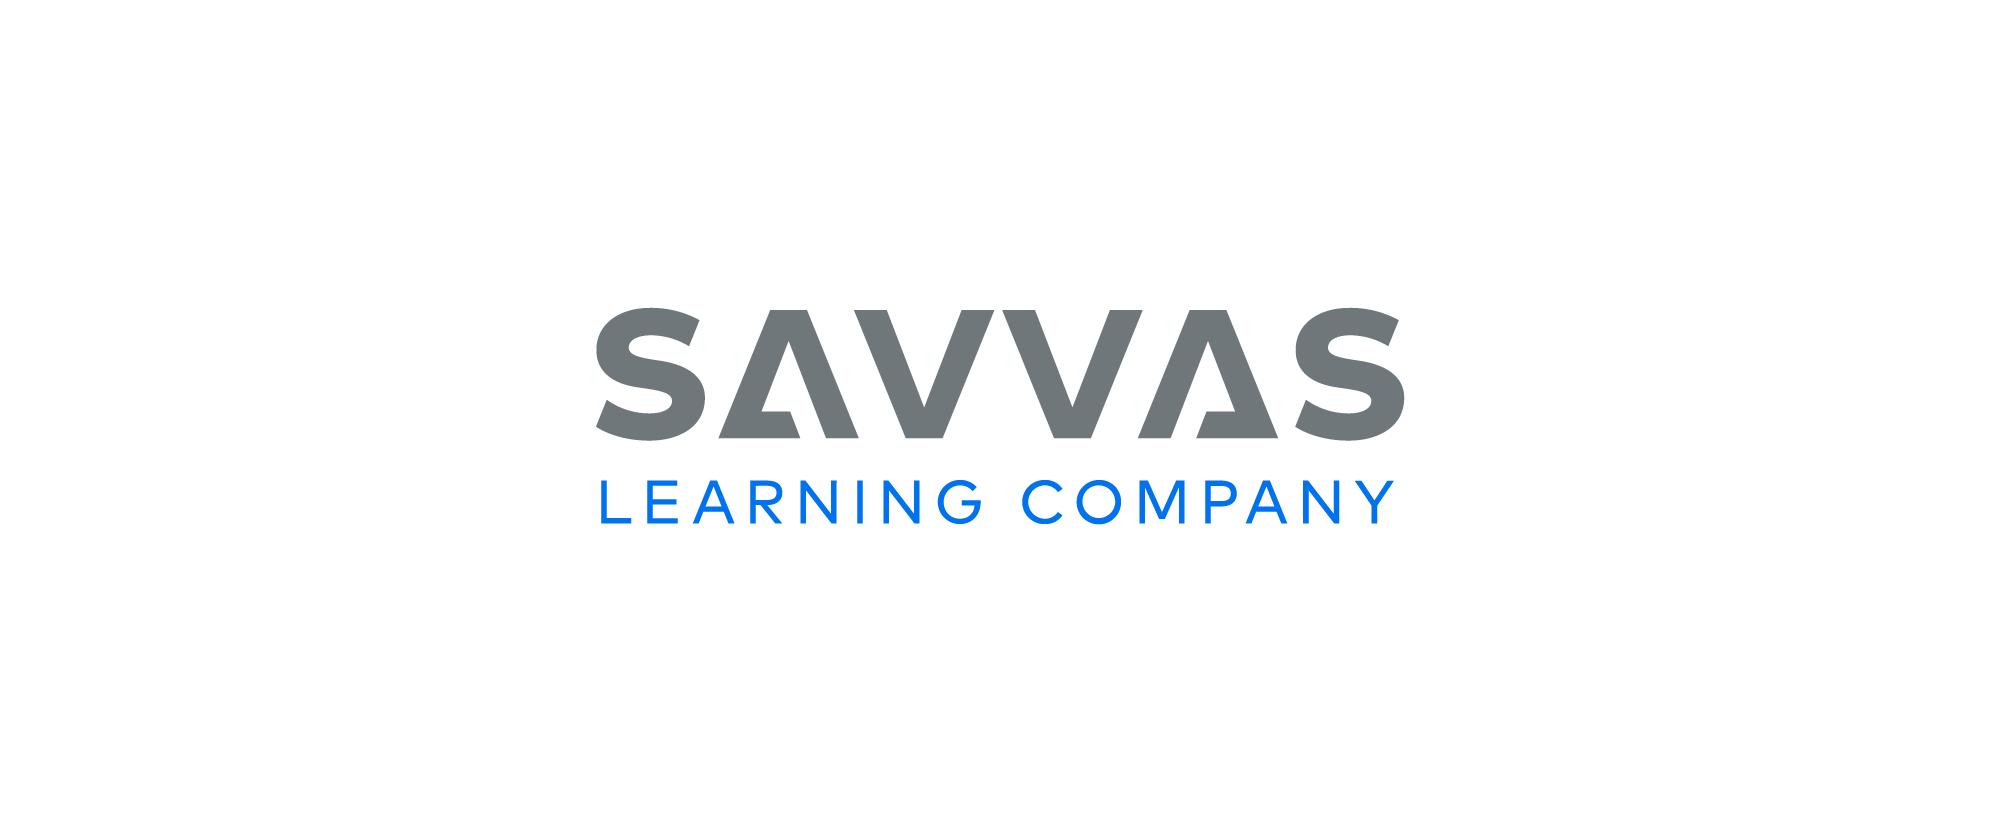 New Name and Logo for Savvas